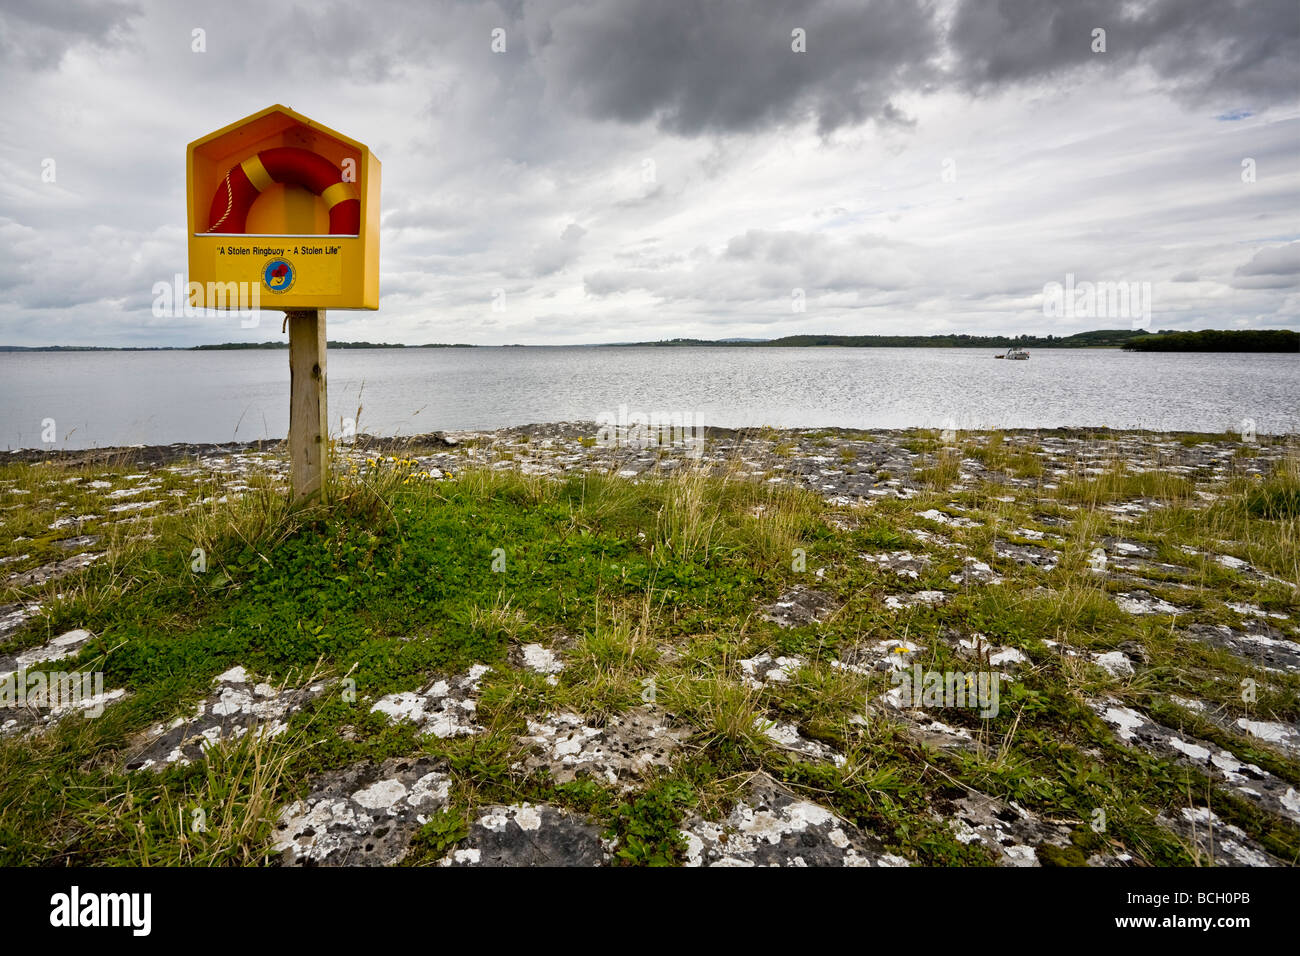 Lifebelt, Barley Harbour, Lough Ree, Cashel, County Longford, Republic of Ireland Stock Photo